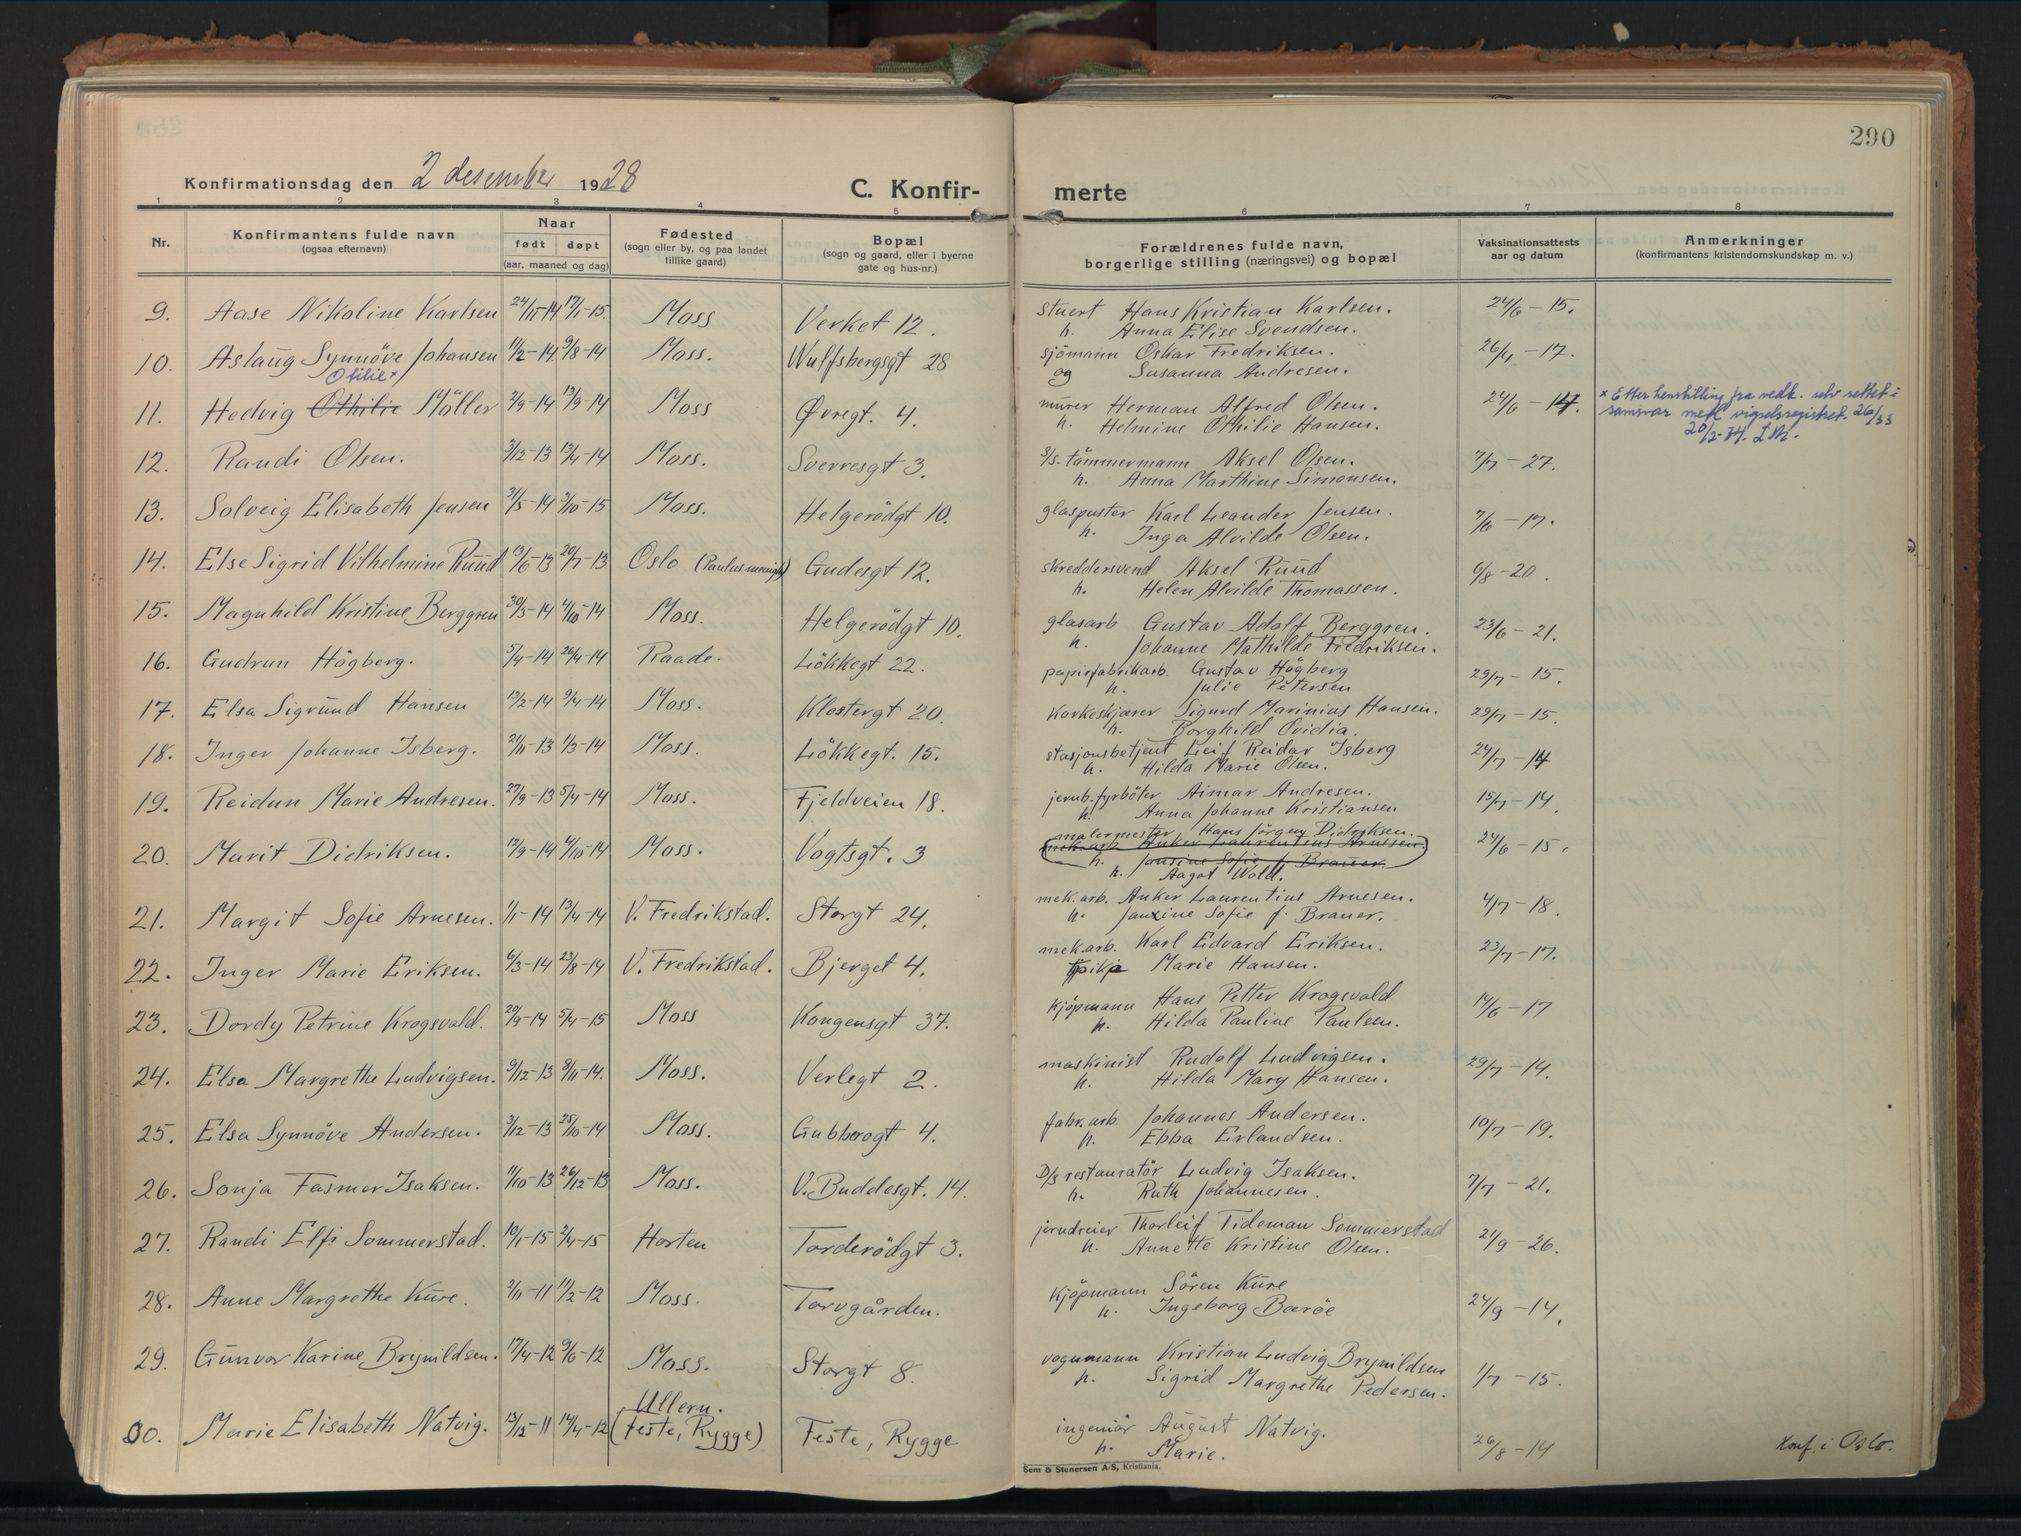 SAO, Moss prestekontor Kirkebøker, F/Fb/Fab/L0006: Parish register (official) no. II 6, 1924-1932, p. 290